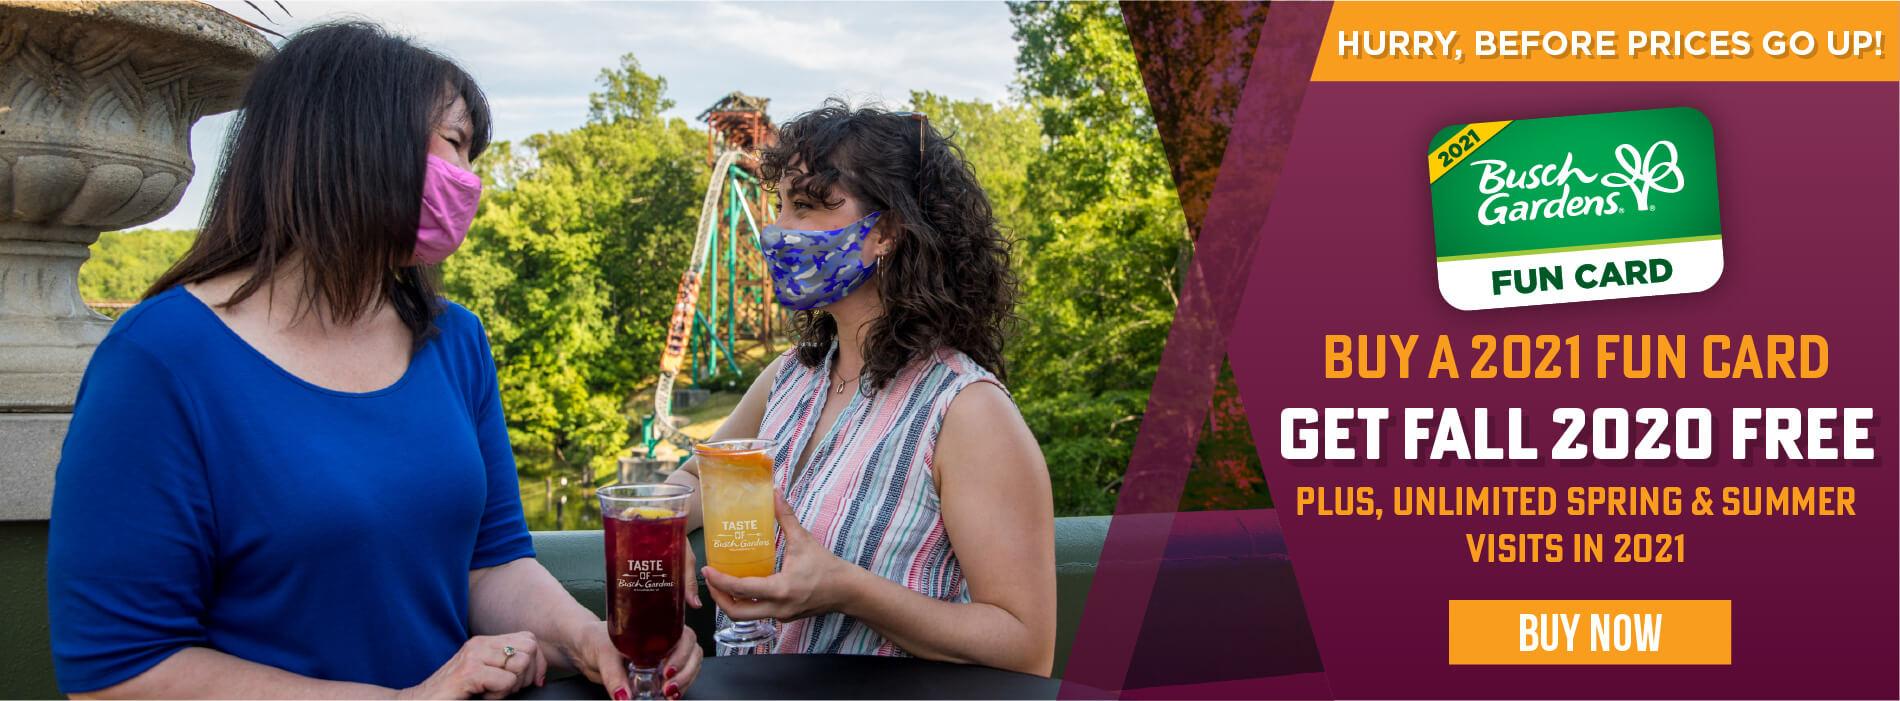 Busch Gardens Williamsburg & Water Country USA 2021 Fun Card Sale